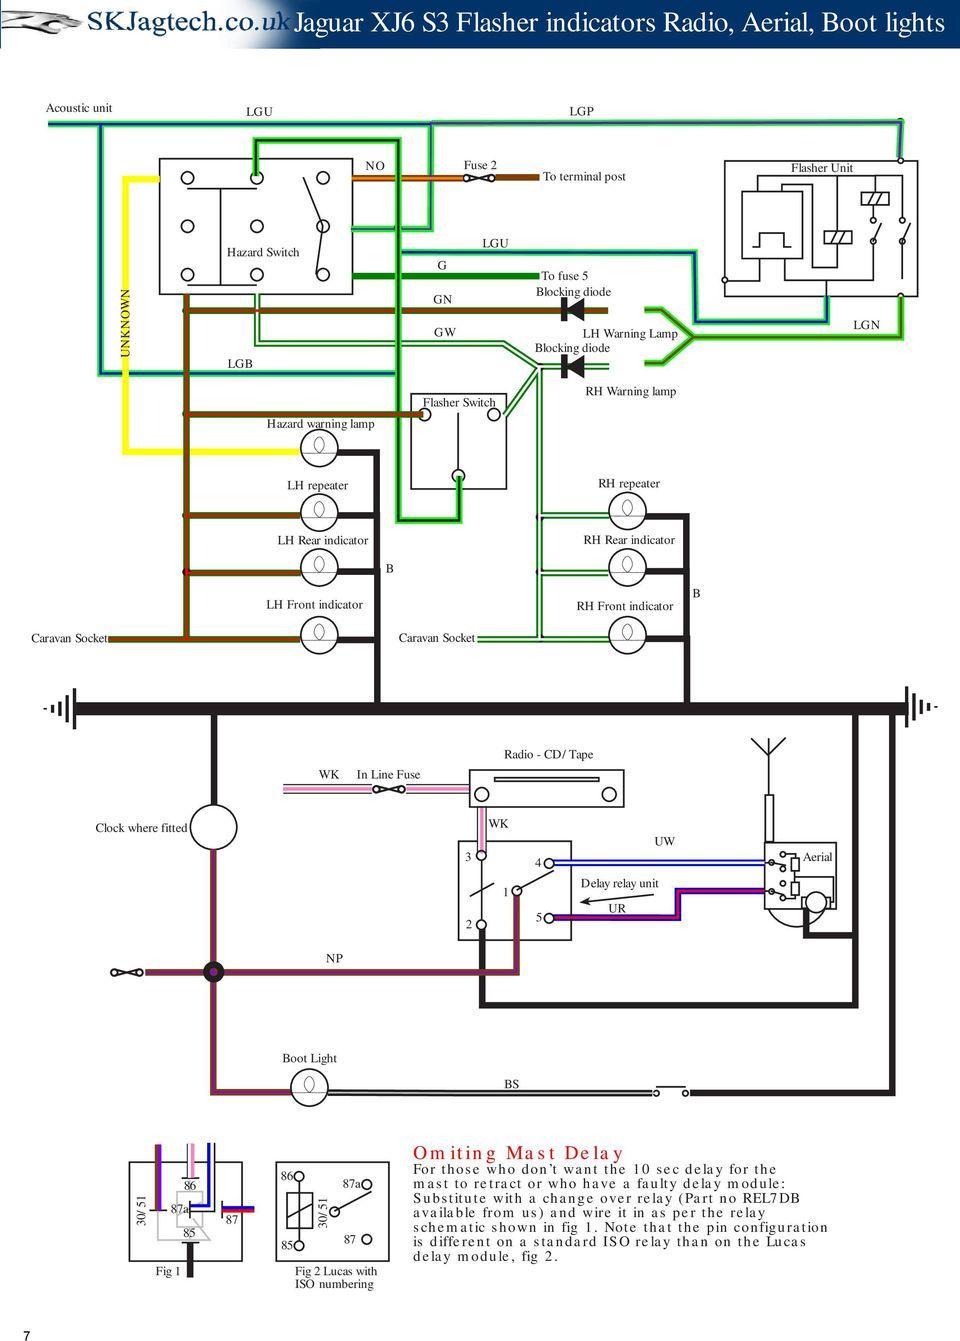 medium resolution of cd tape clock where fitted 3 2 wk 1 4 5 delay relay unit ur 8 jaguar xj6